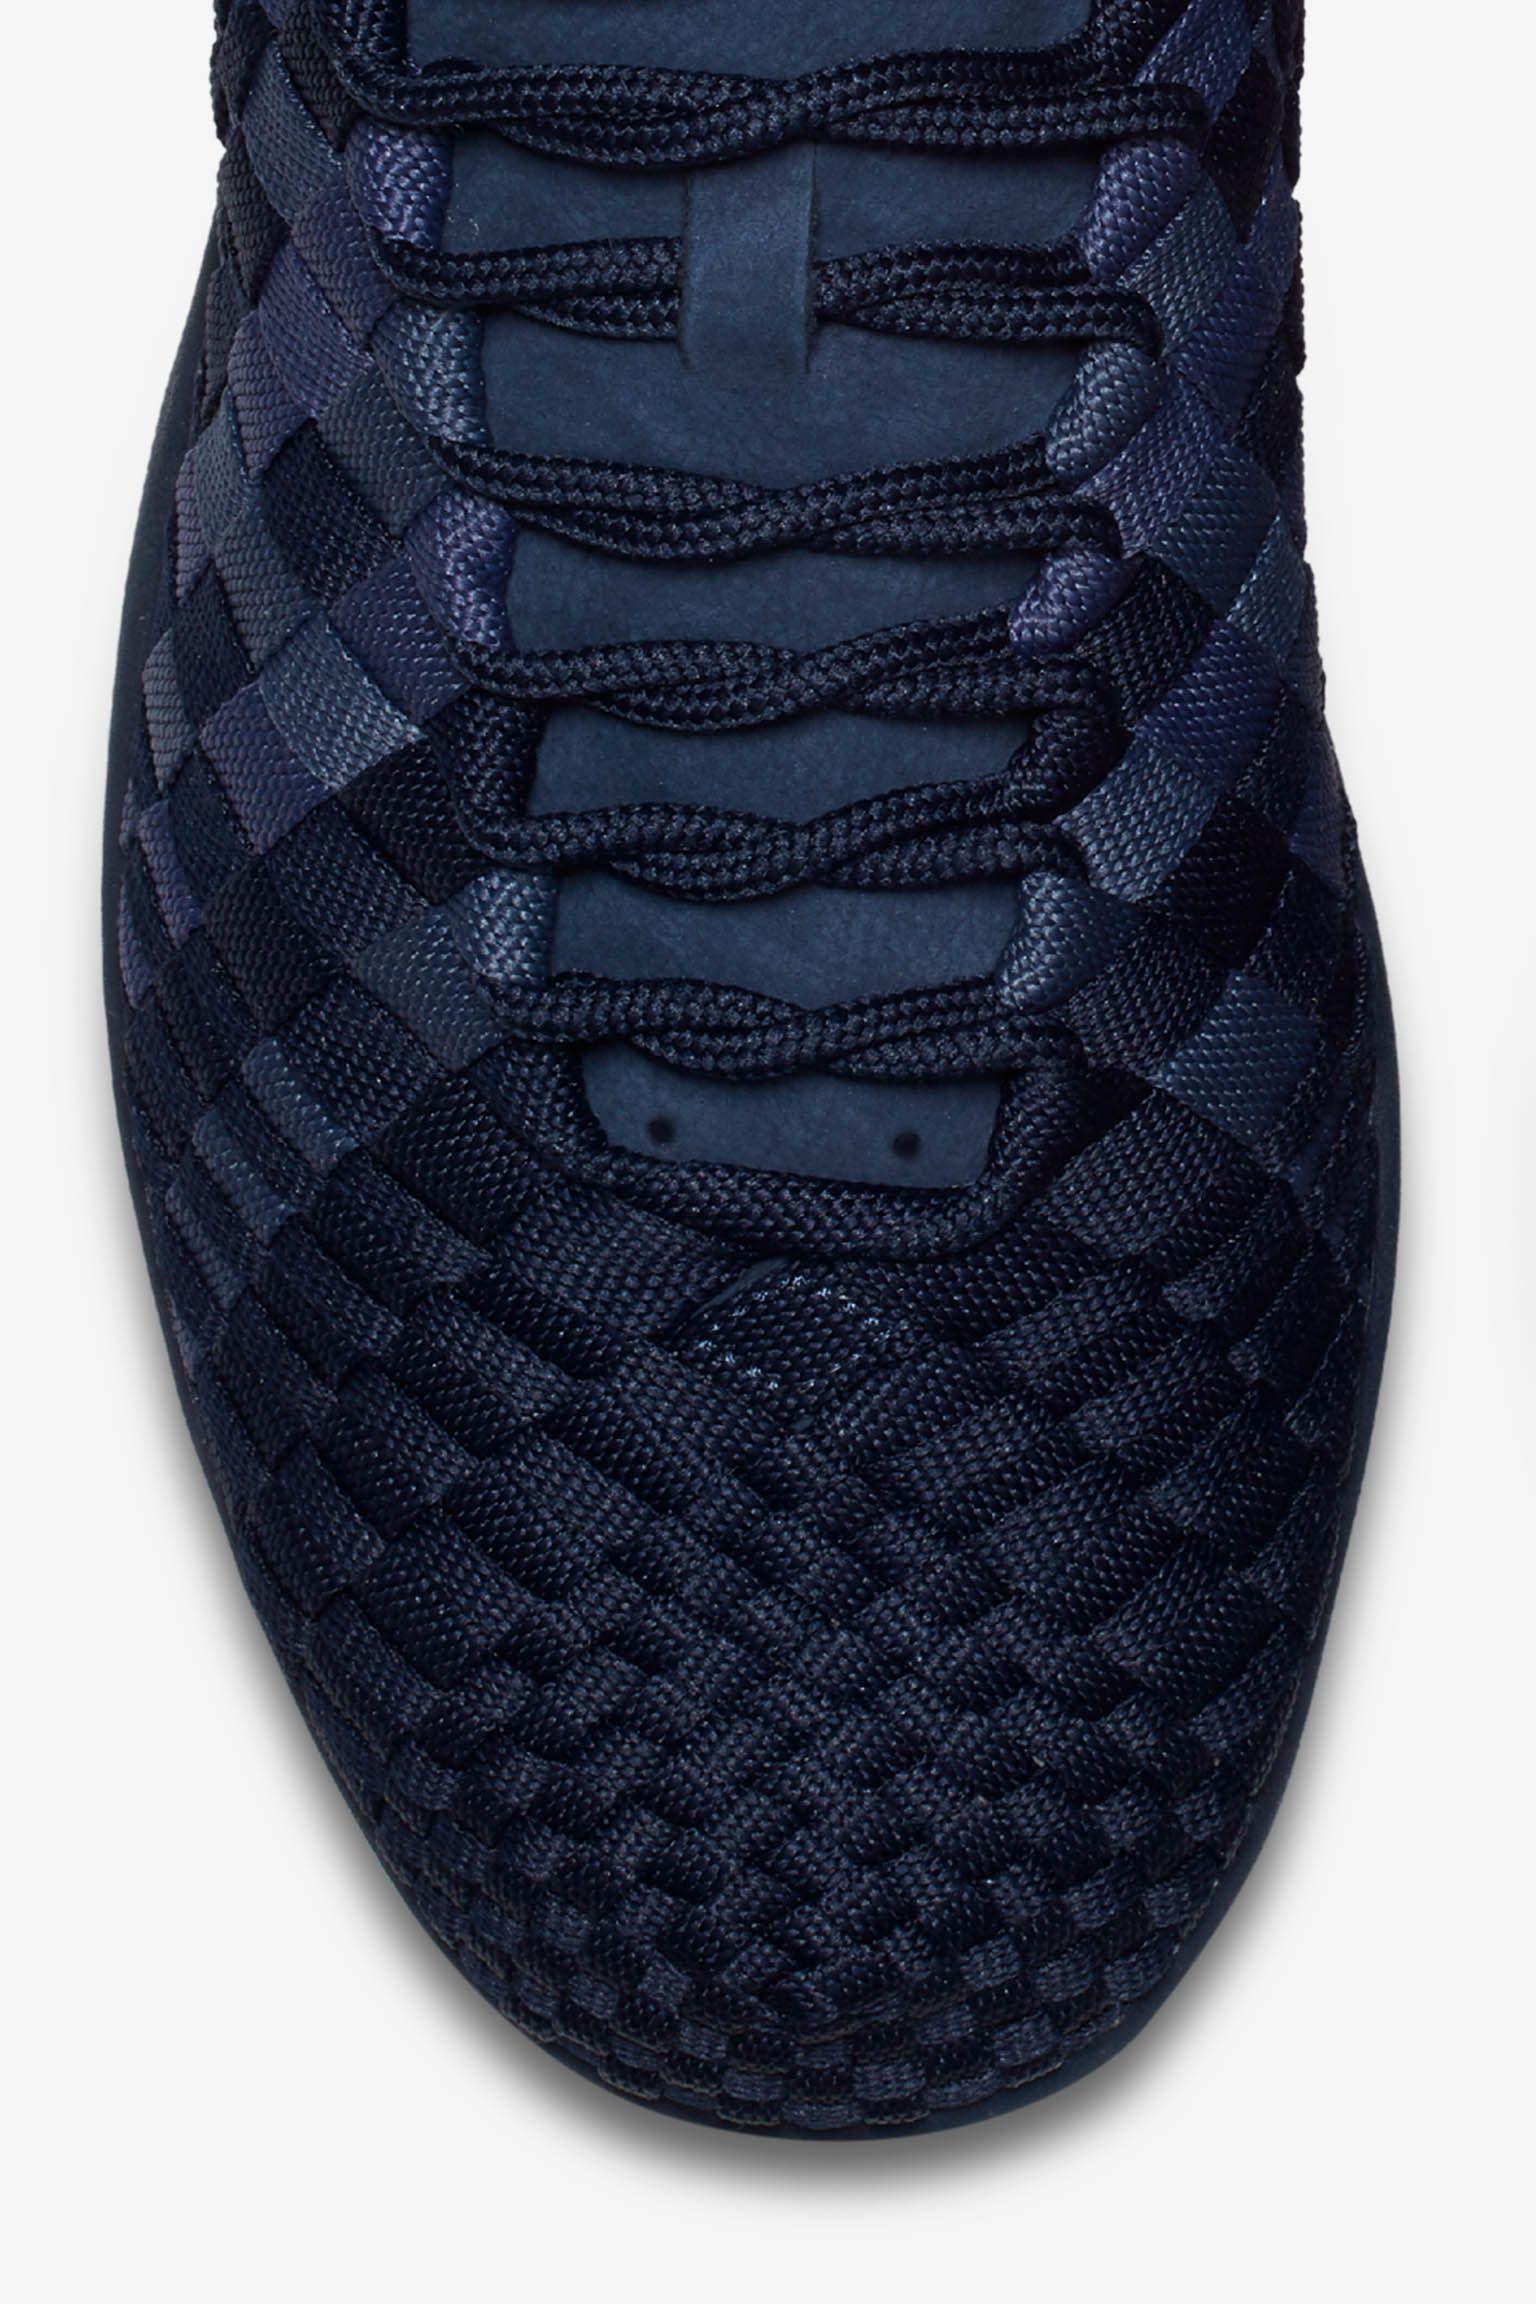 Nike Air Vapormax Inneva 'Midnight Navy & Metallic Silver' Release Date